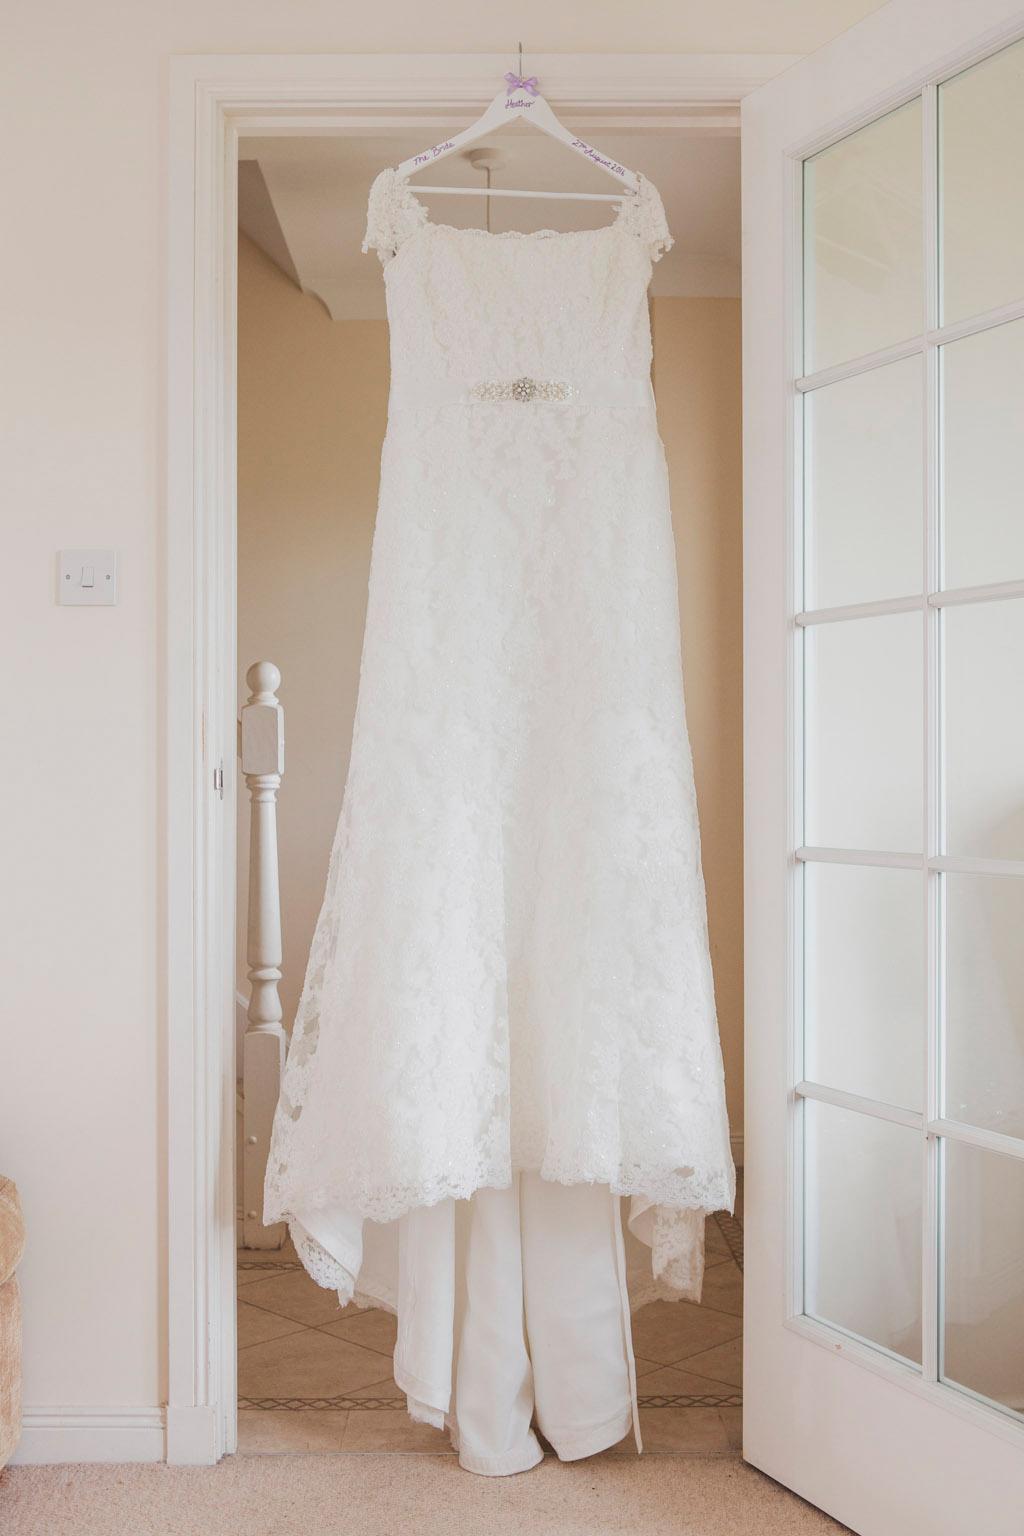 001-romantic-wedding-dress.jpg